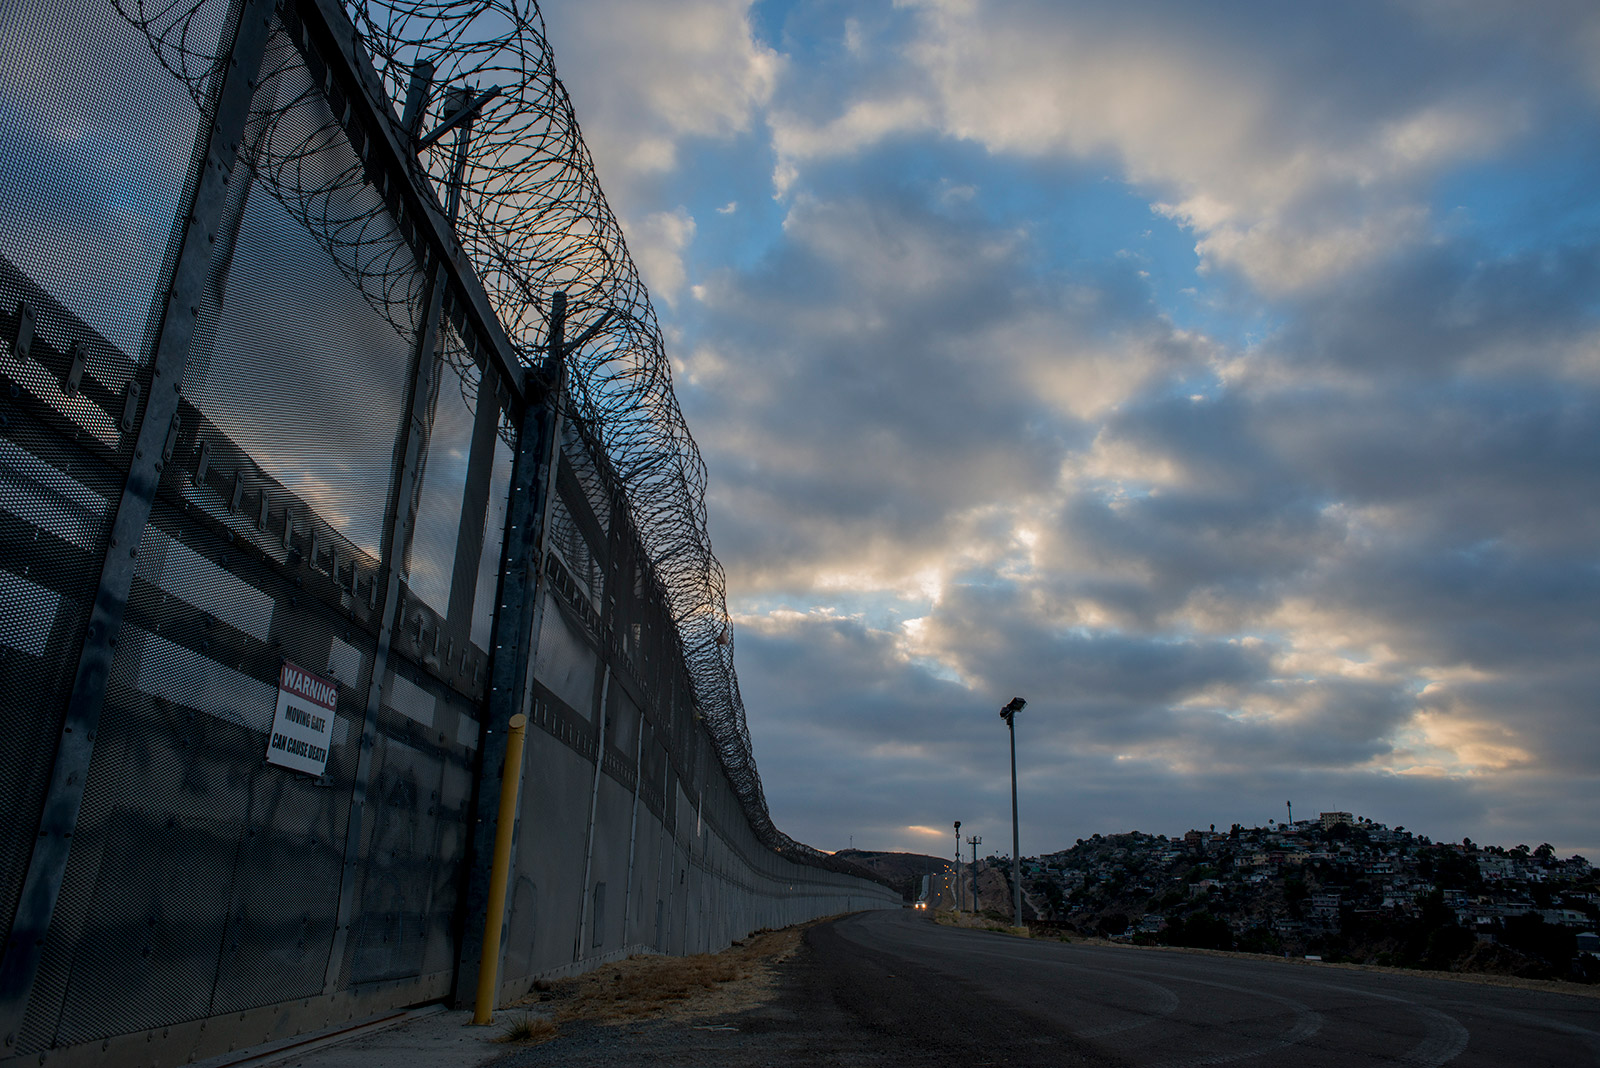 America S Wall Inewsource